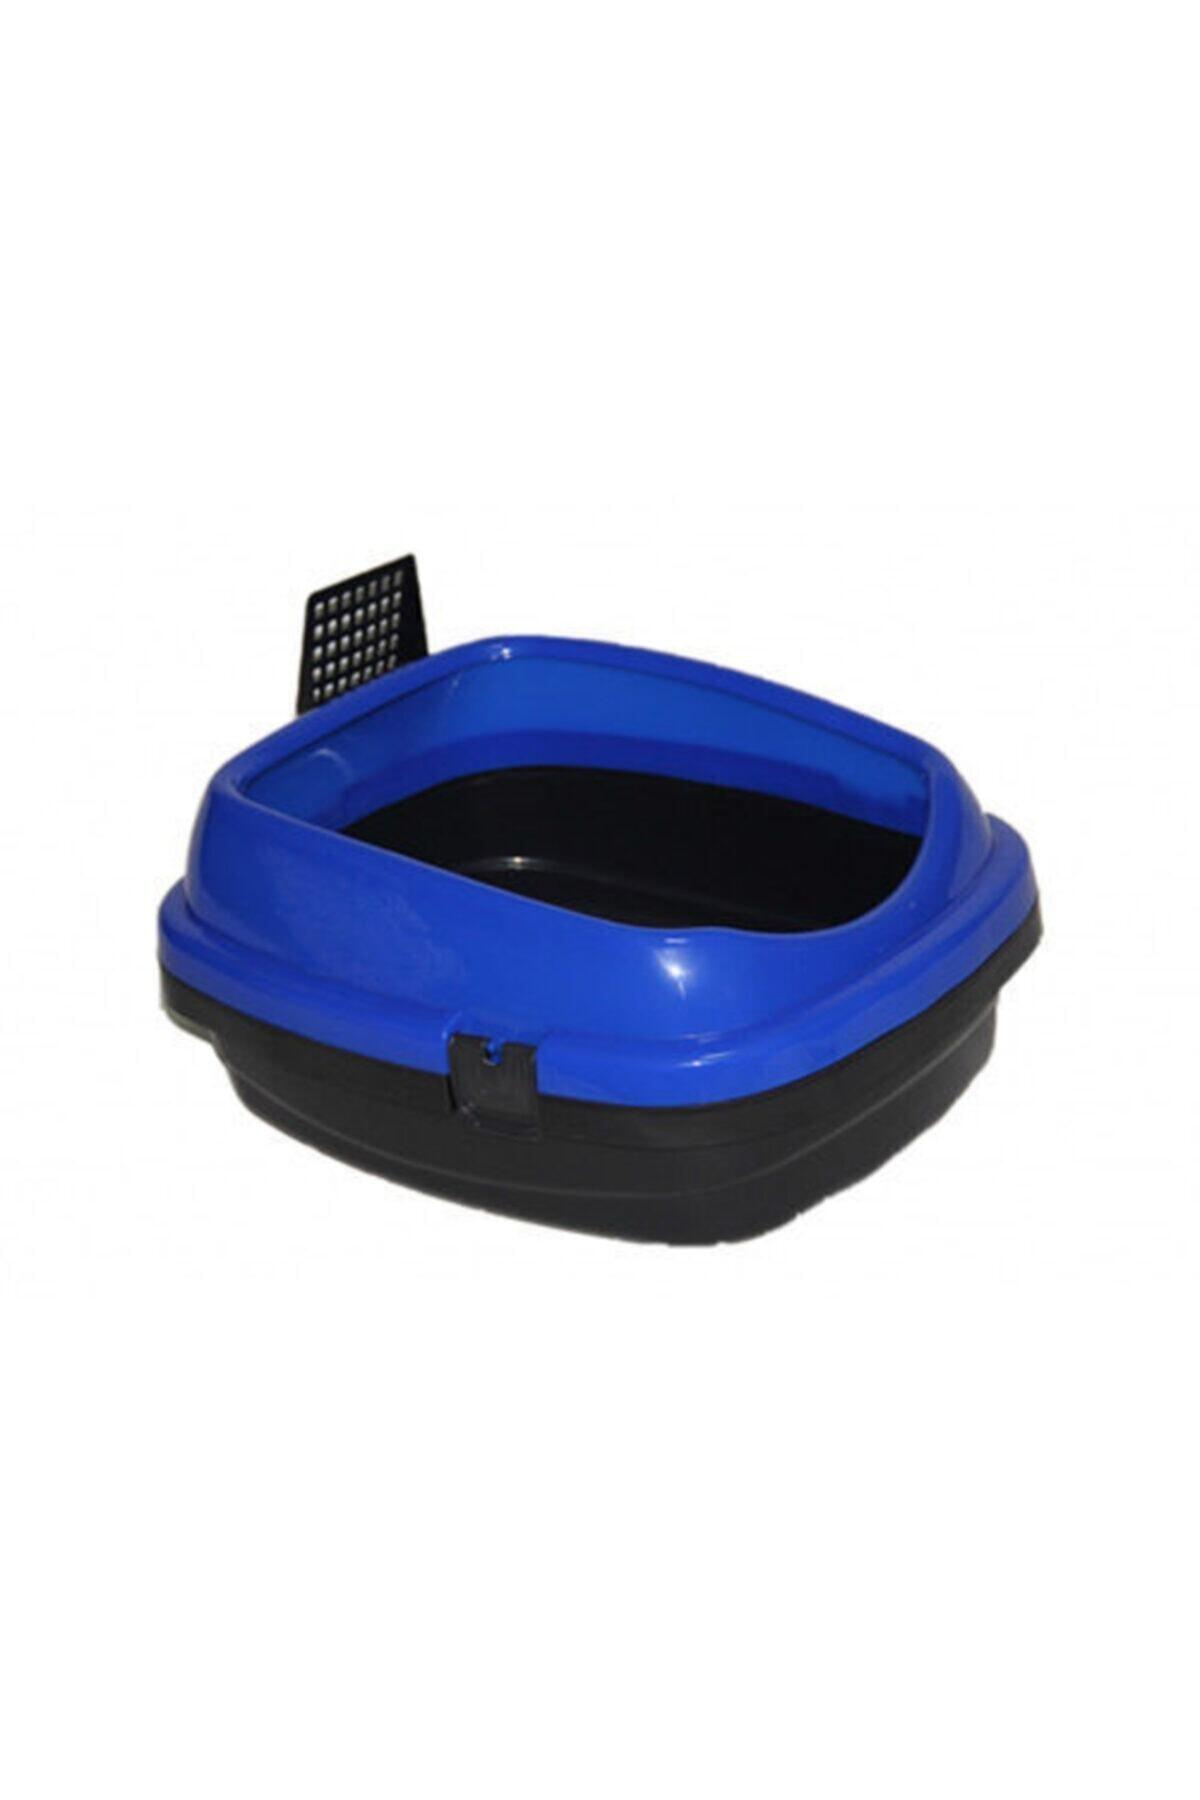 Açık Kedi Tuvaleti Mavi 49.5x40x22 Cm